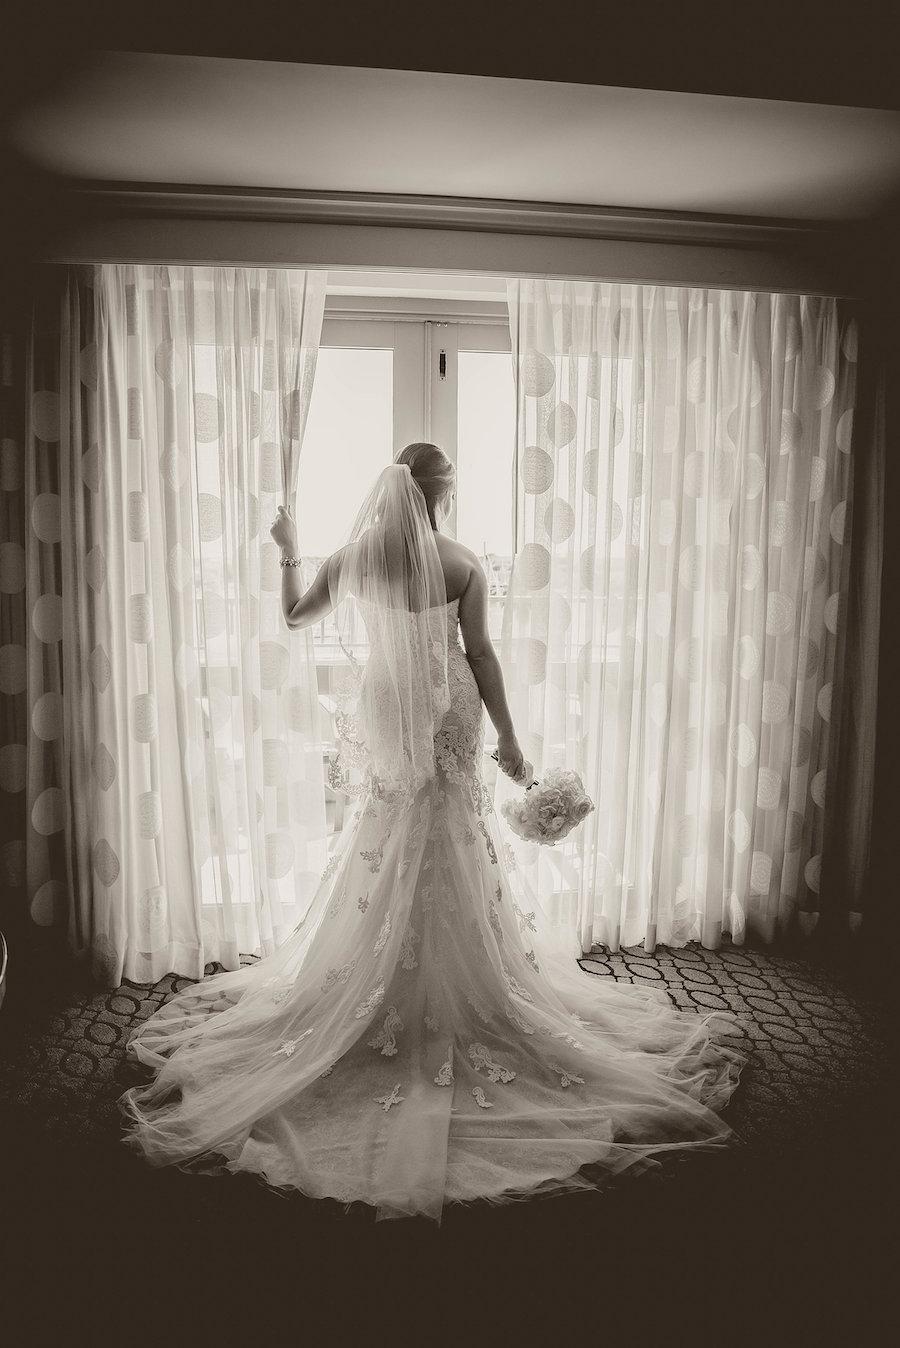 Bridal Wedding Portrait in Stella York Sweetheart Lace Dress | Tampa Bay Wedding Photographer Kristen Marie Photography | St. Petersburg Wedding